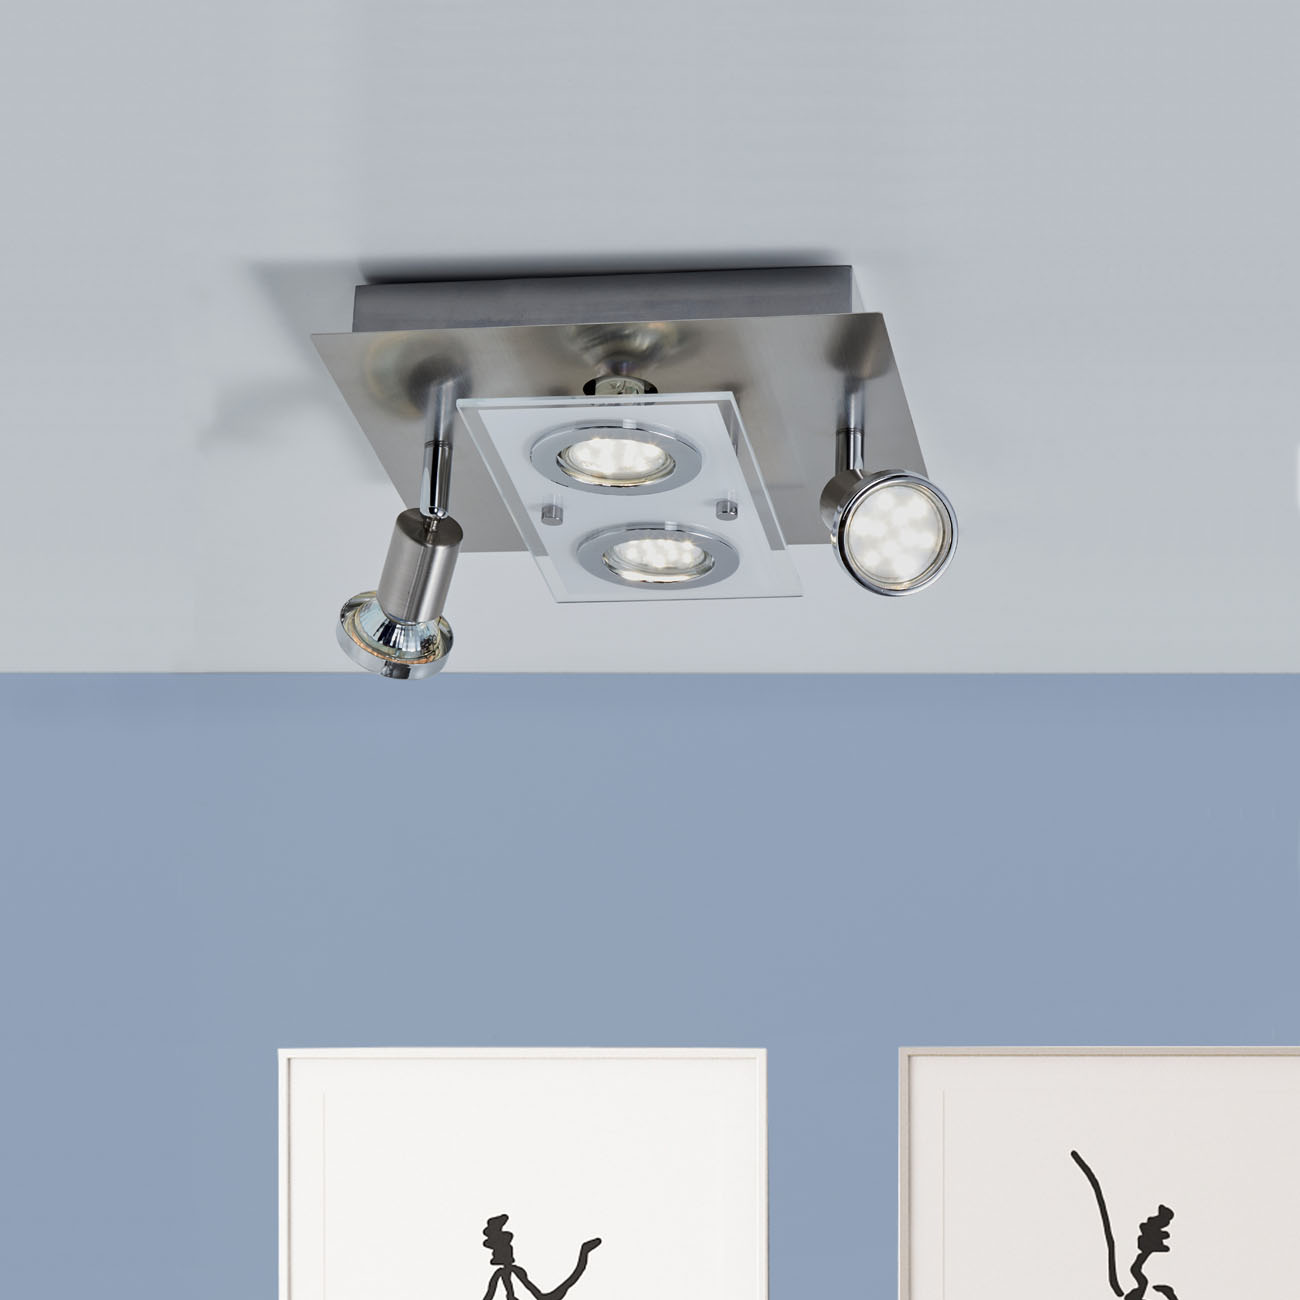 LED Kombi Deckenleuchte Spotleuchte 4-flammig  - 2